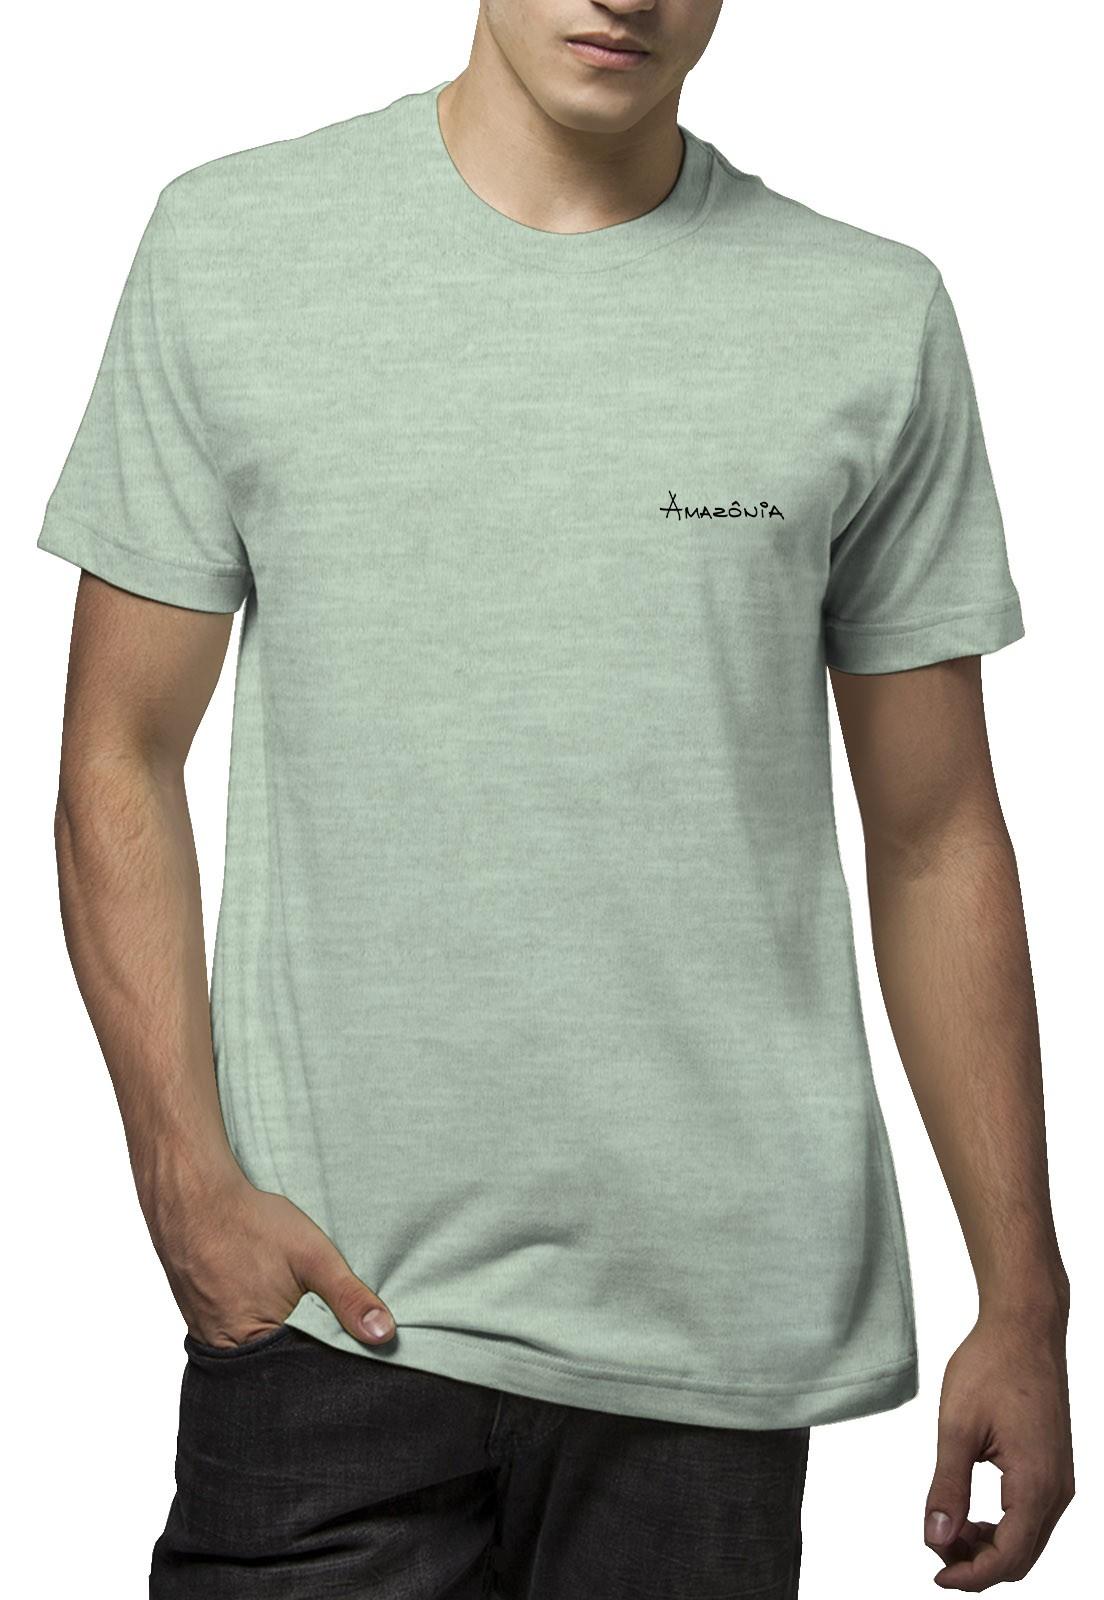 Camiseta Amazônia Folha Tartaruga - Mescla Verde